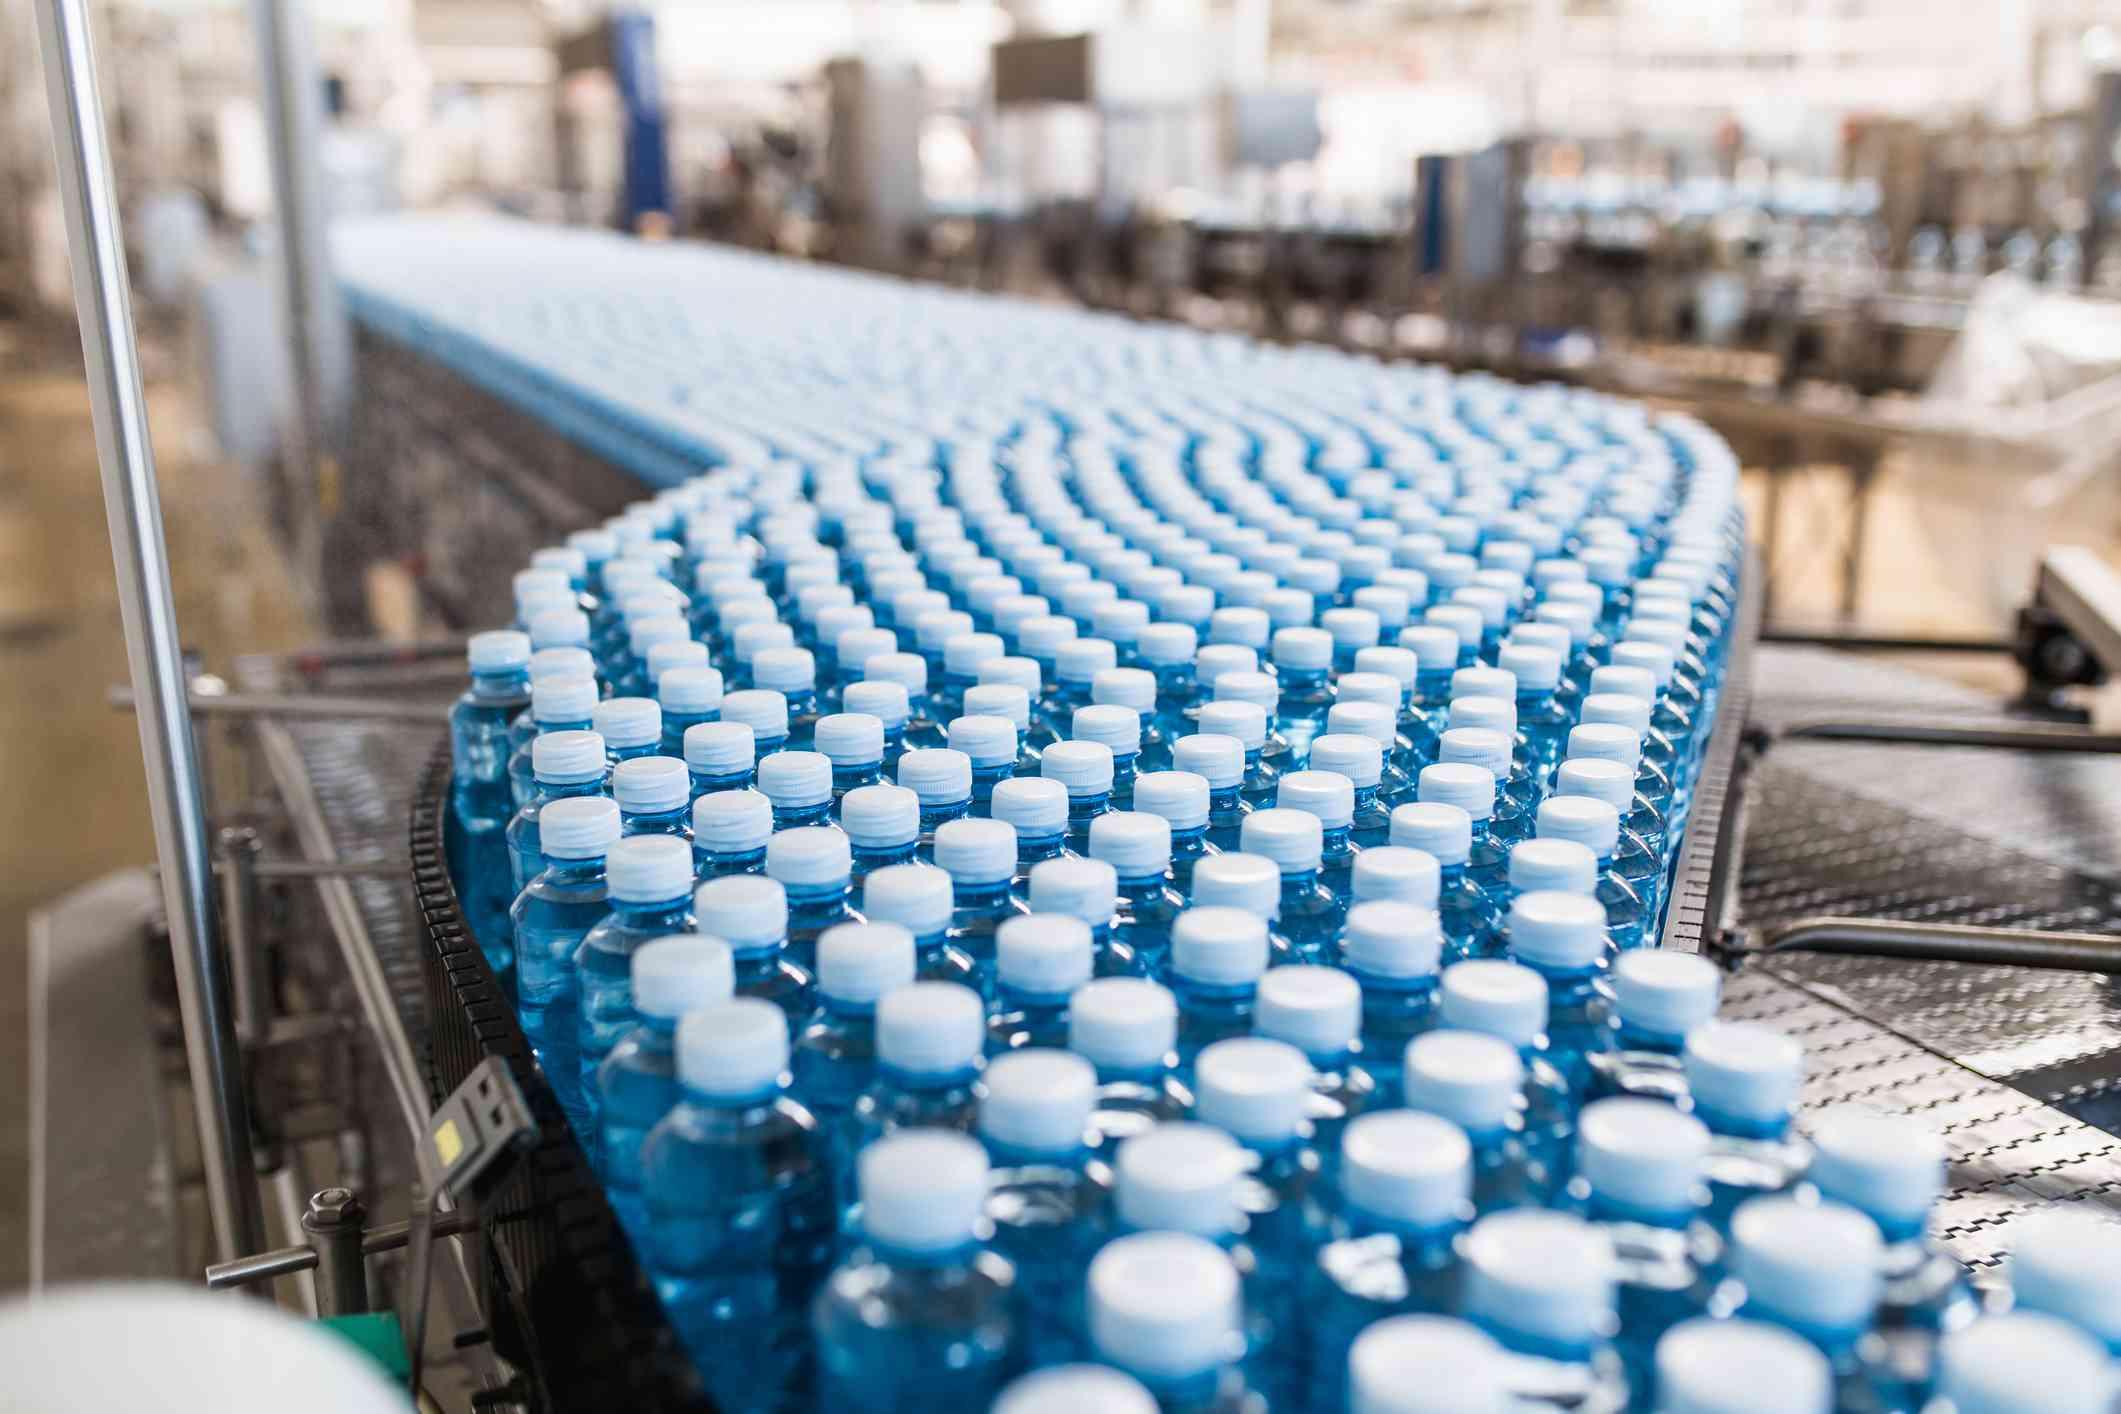 Plastic water bottles on a conveyor belt.